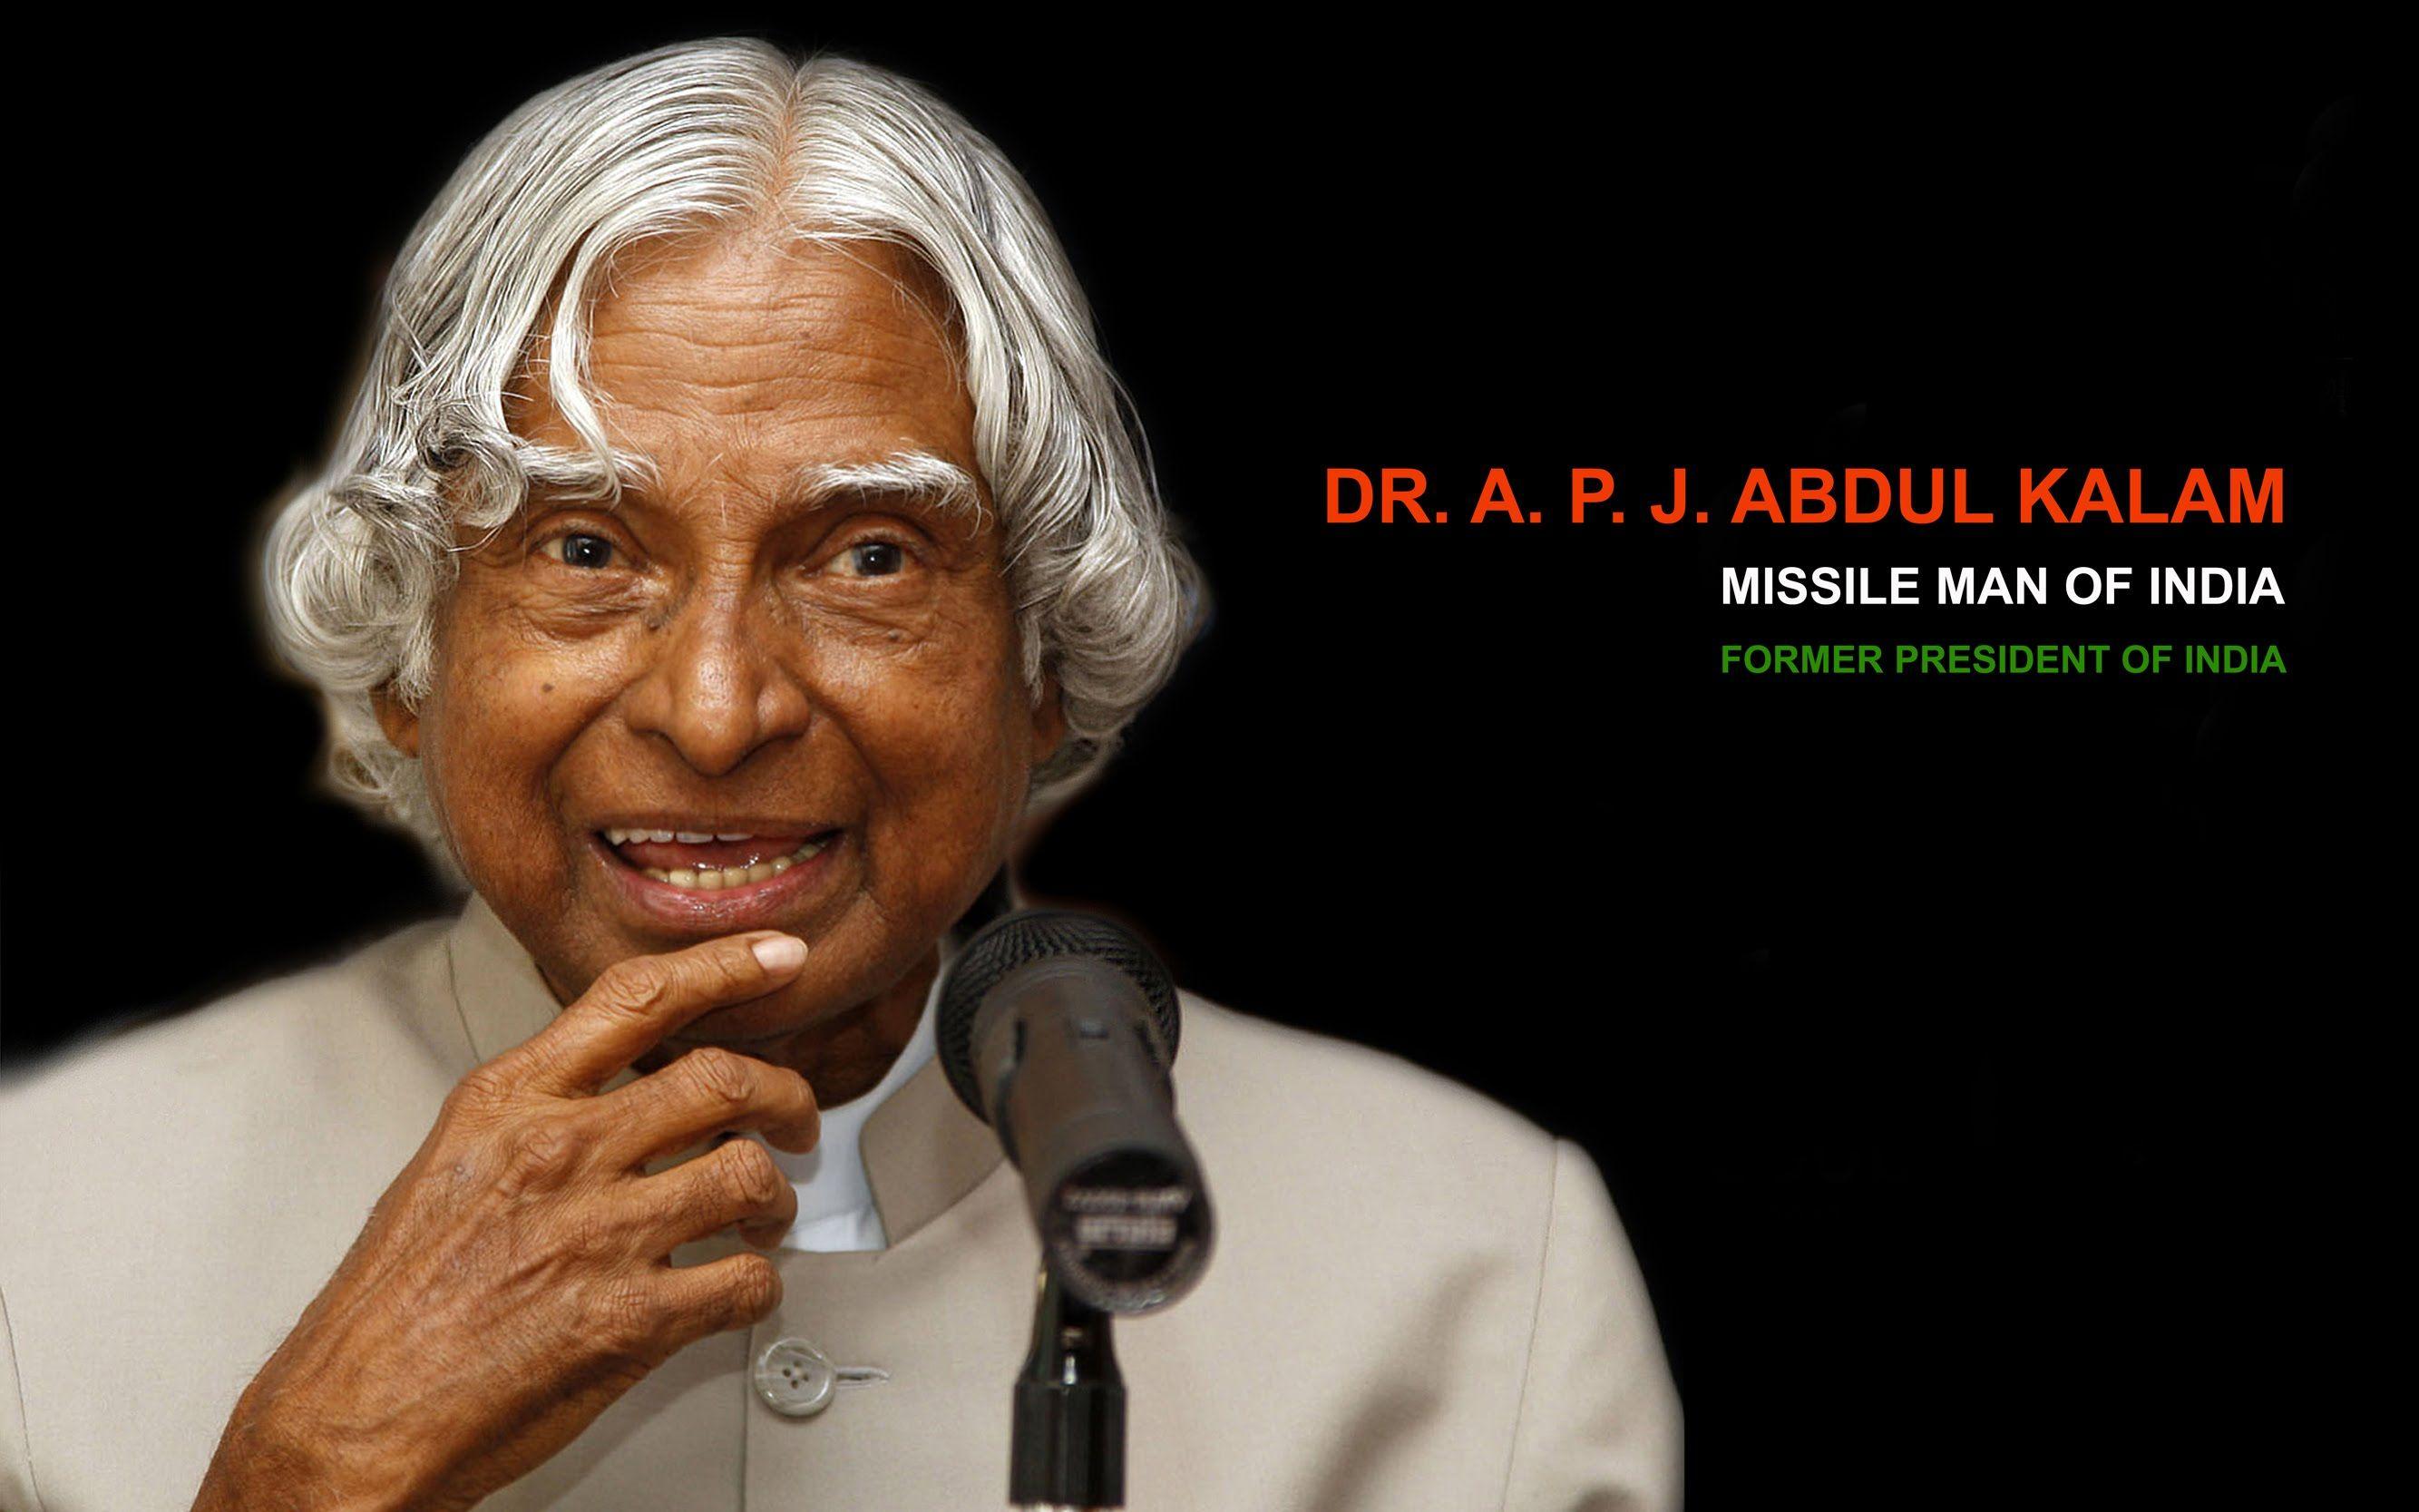 Dr. APJ Abdul Kalam Biography in Hindi By Gulzar Saab